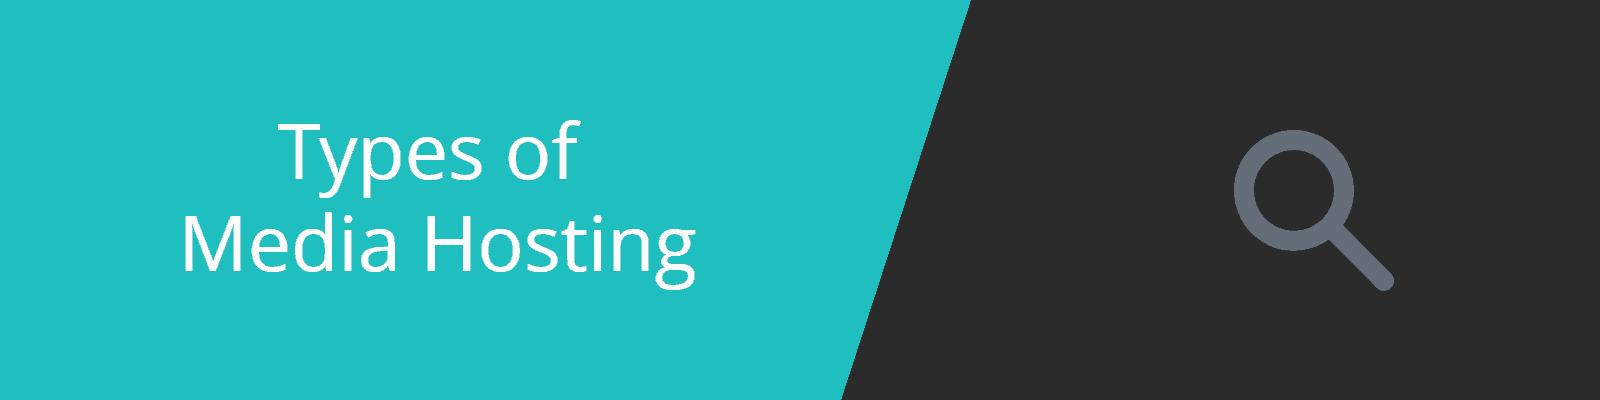 types of media hosting